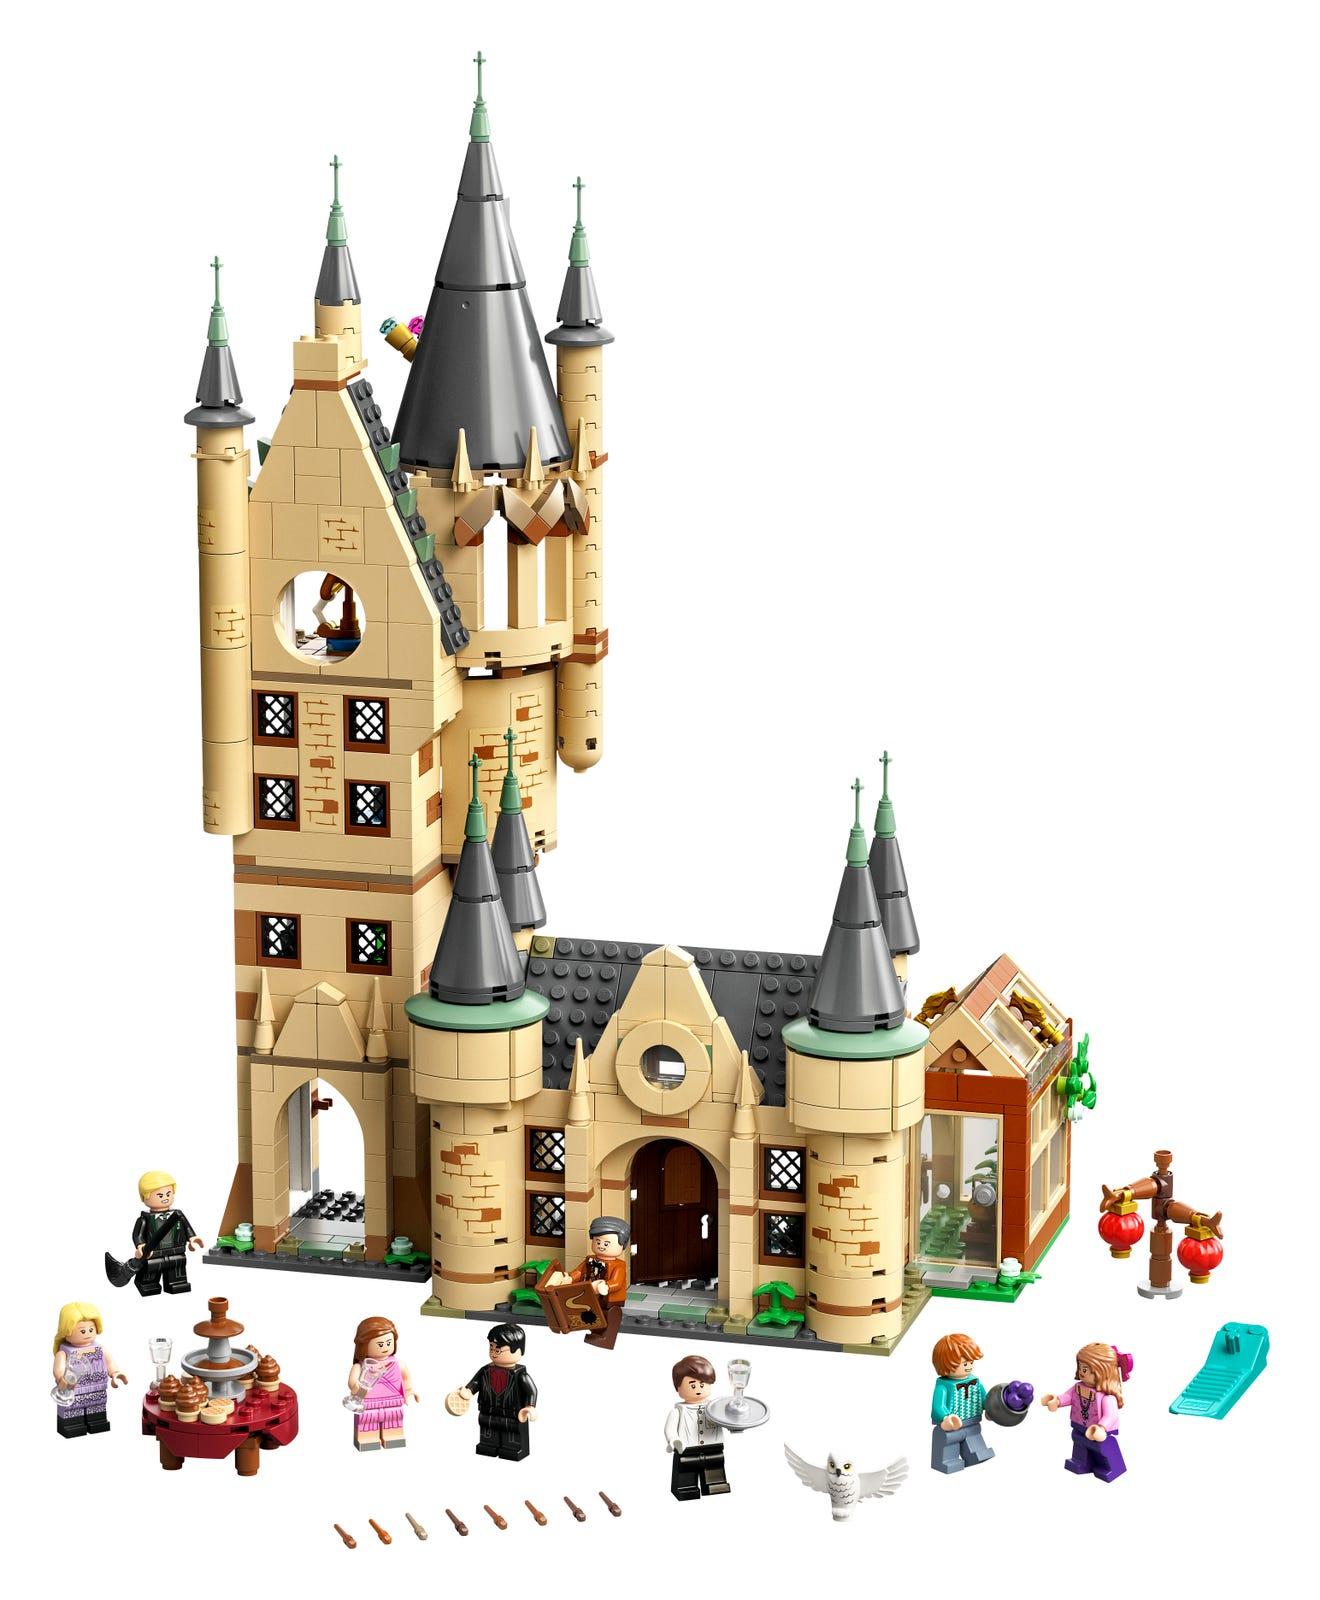 LEGO HARRY POTTER TORRE DI ASTRONOMIA DI HOGWARTS™ 75969